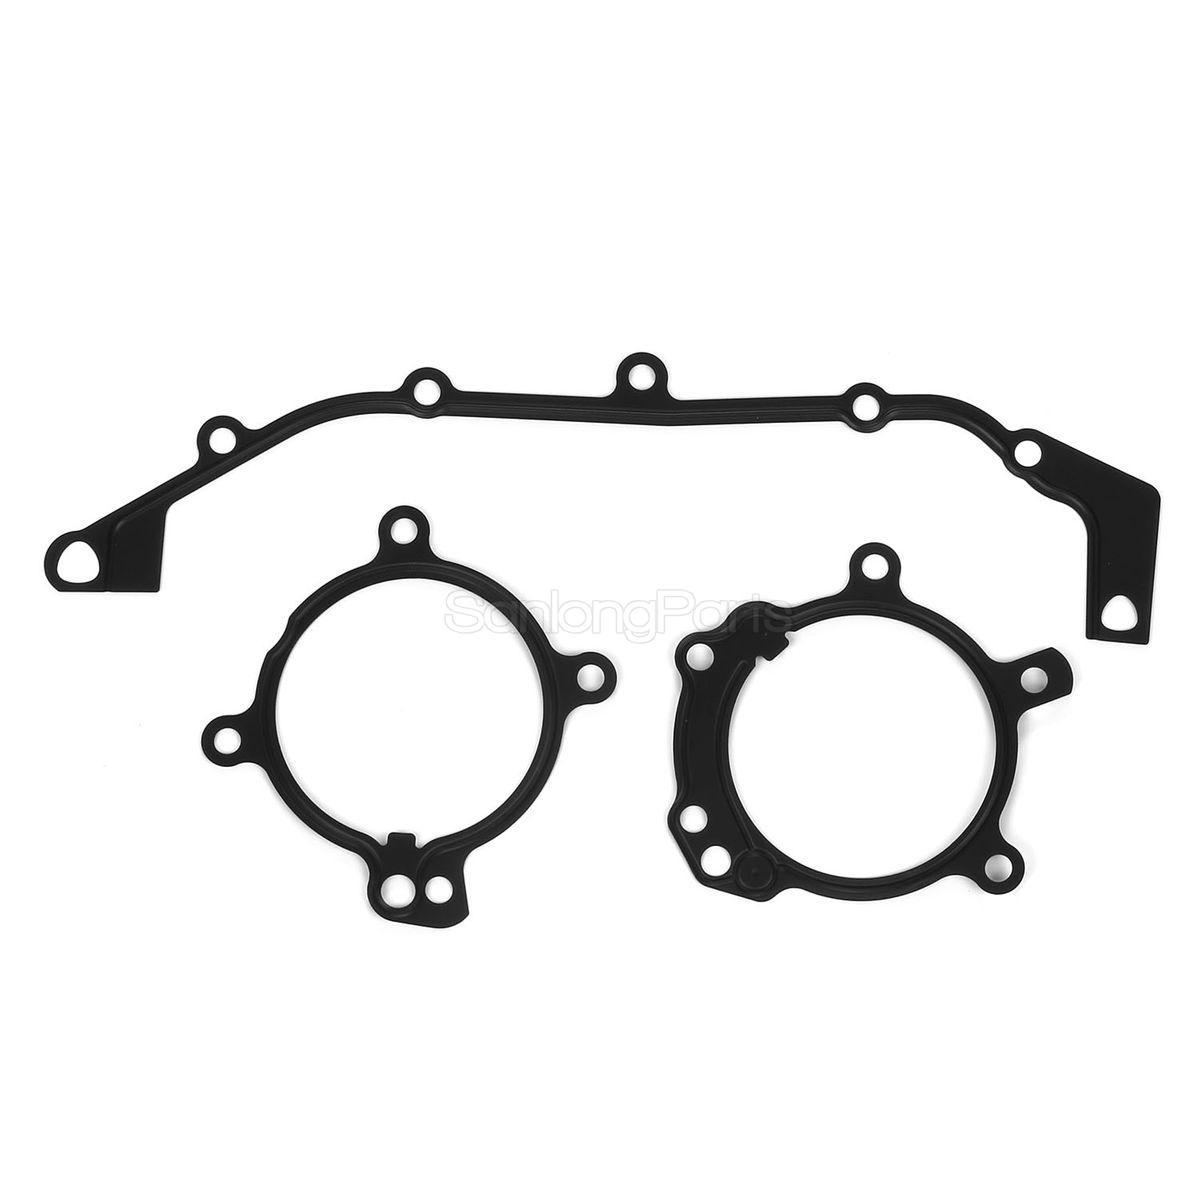 Fits BMW M54 M52tu VCG Twin Vanos Repair Seal Kit